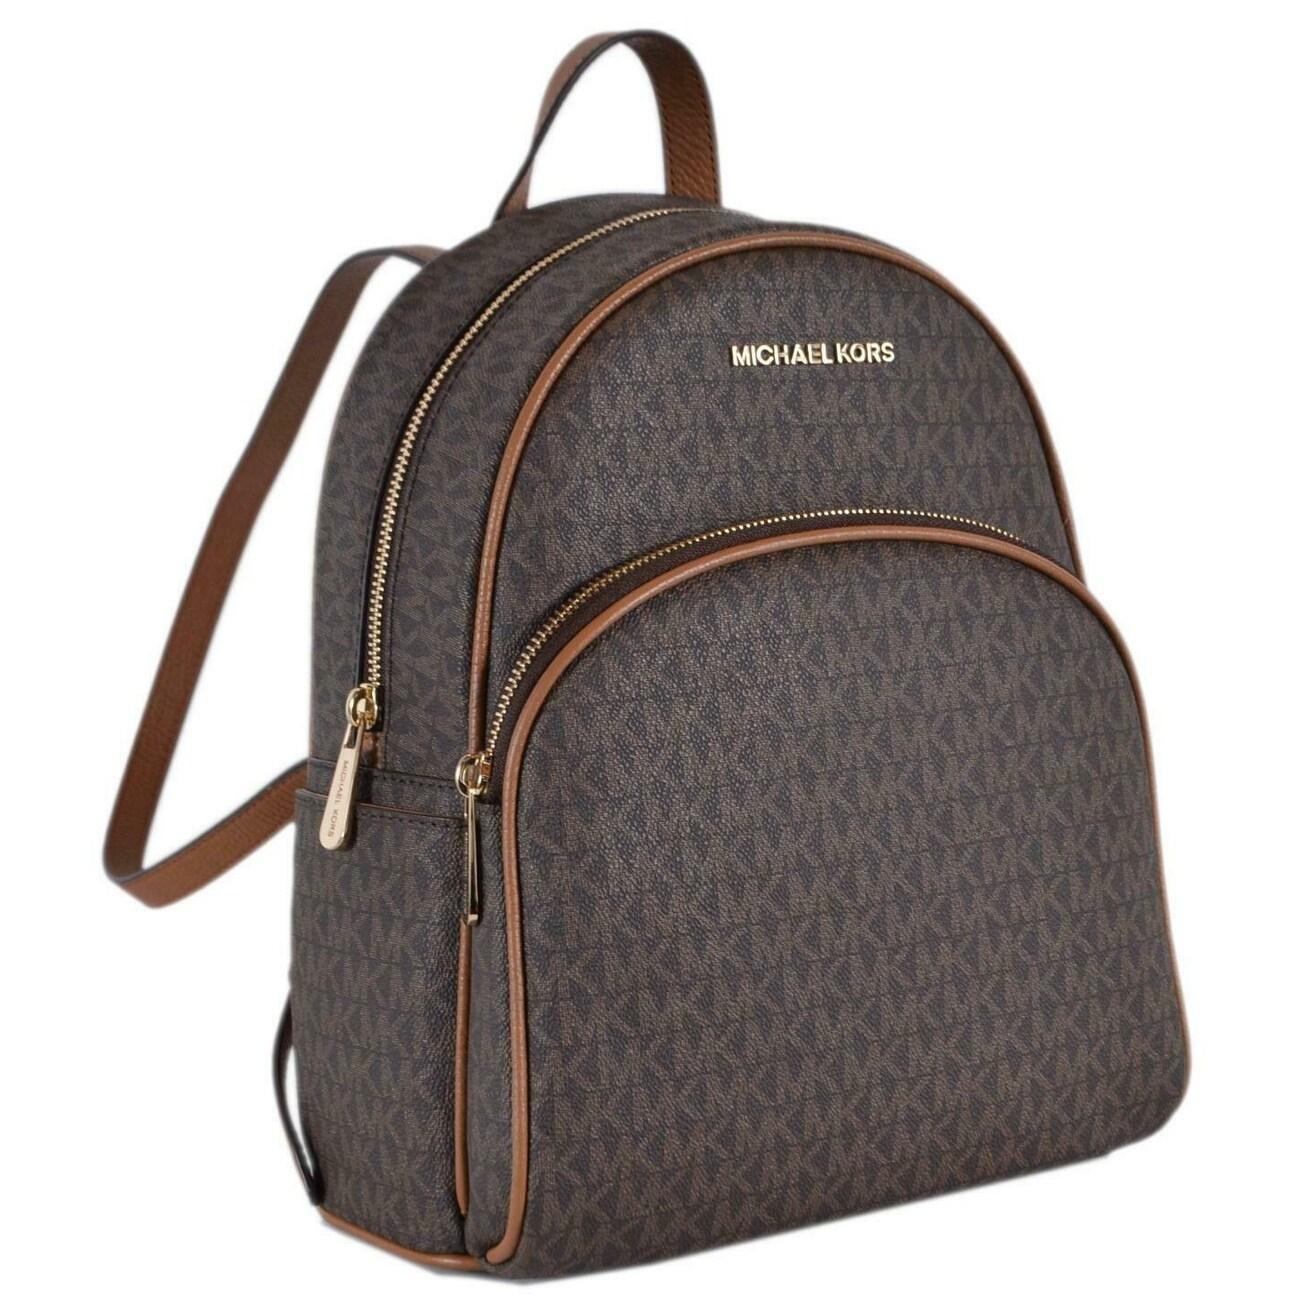 2eaea70decd Michael Kors Brown Acorn Coated Canvas Signature Abbey Backpack Bag - 12